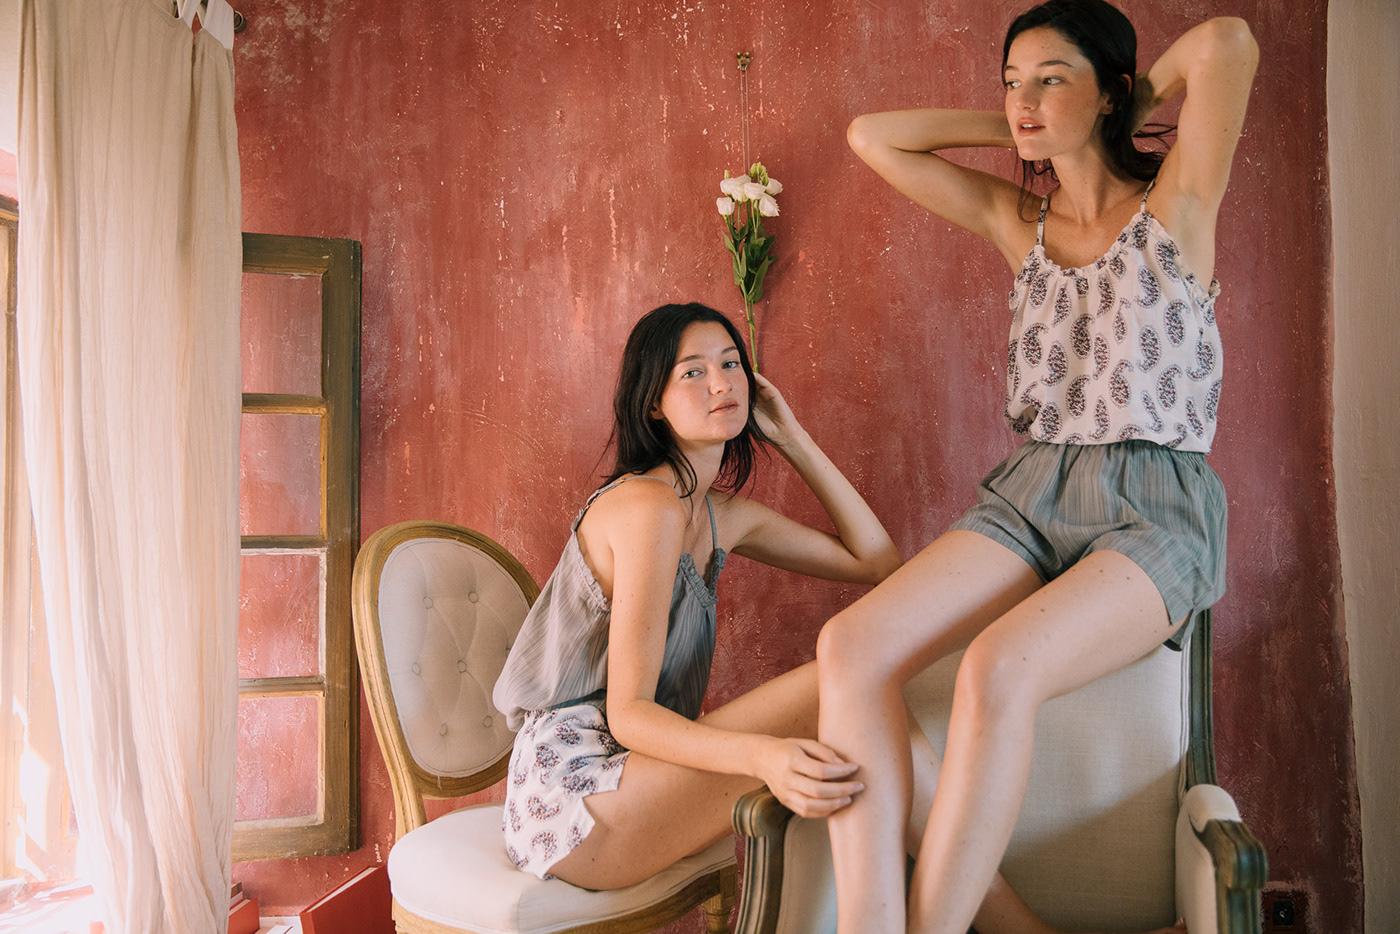 Fashion  Sisters duo women fashion Twins cote d'azur france campaign